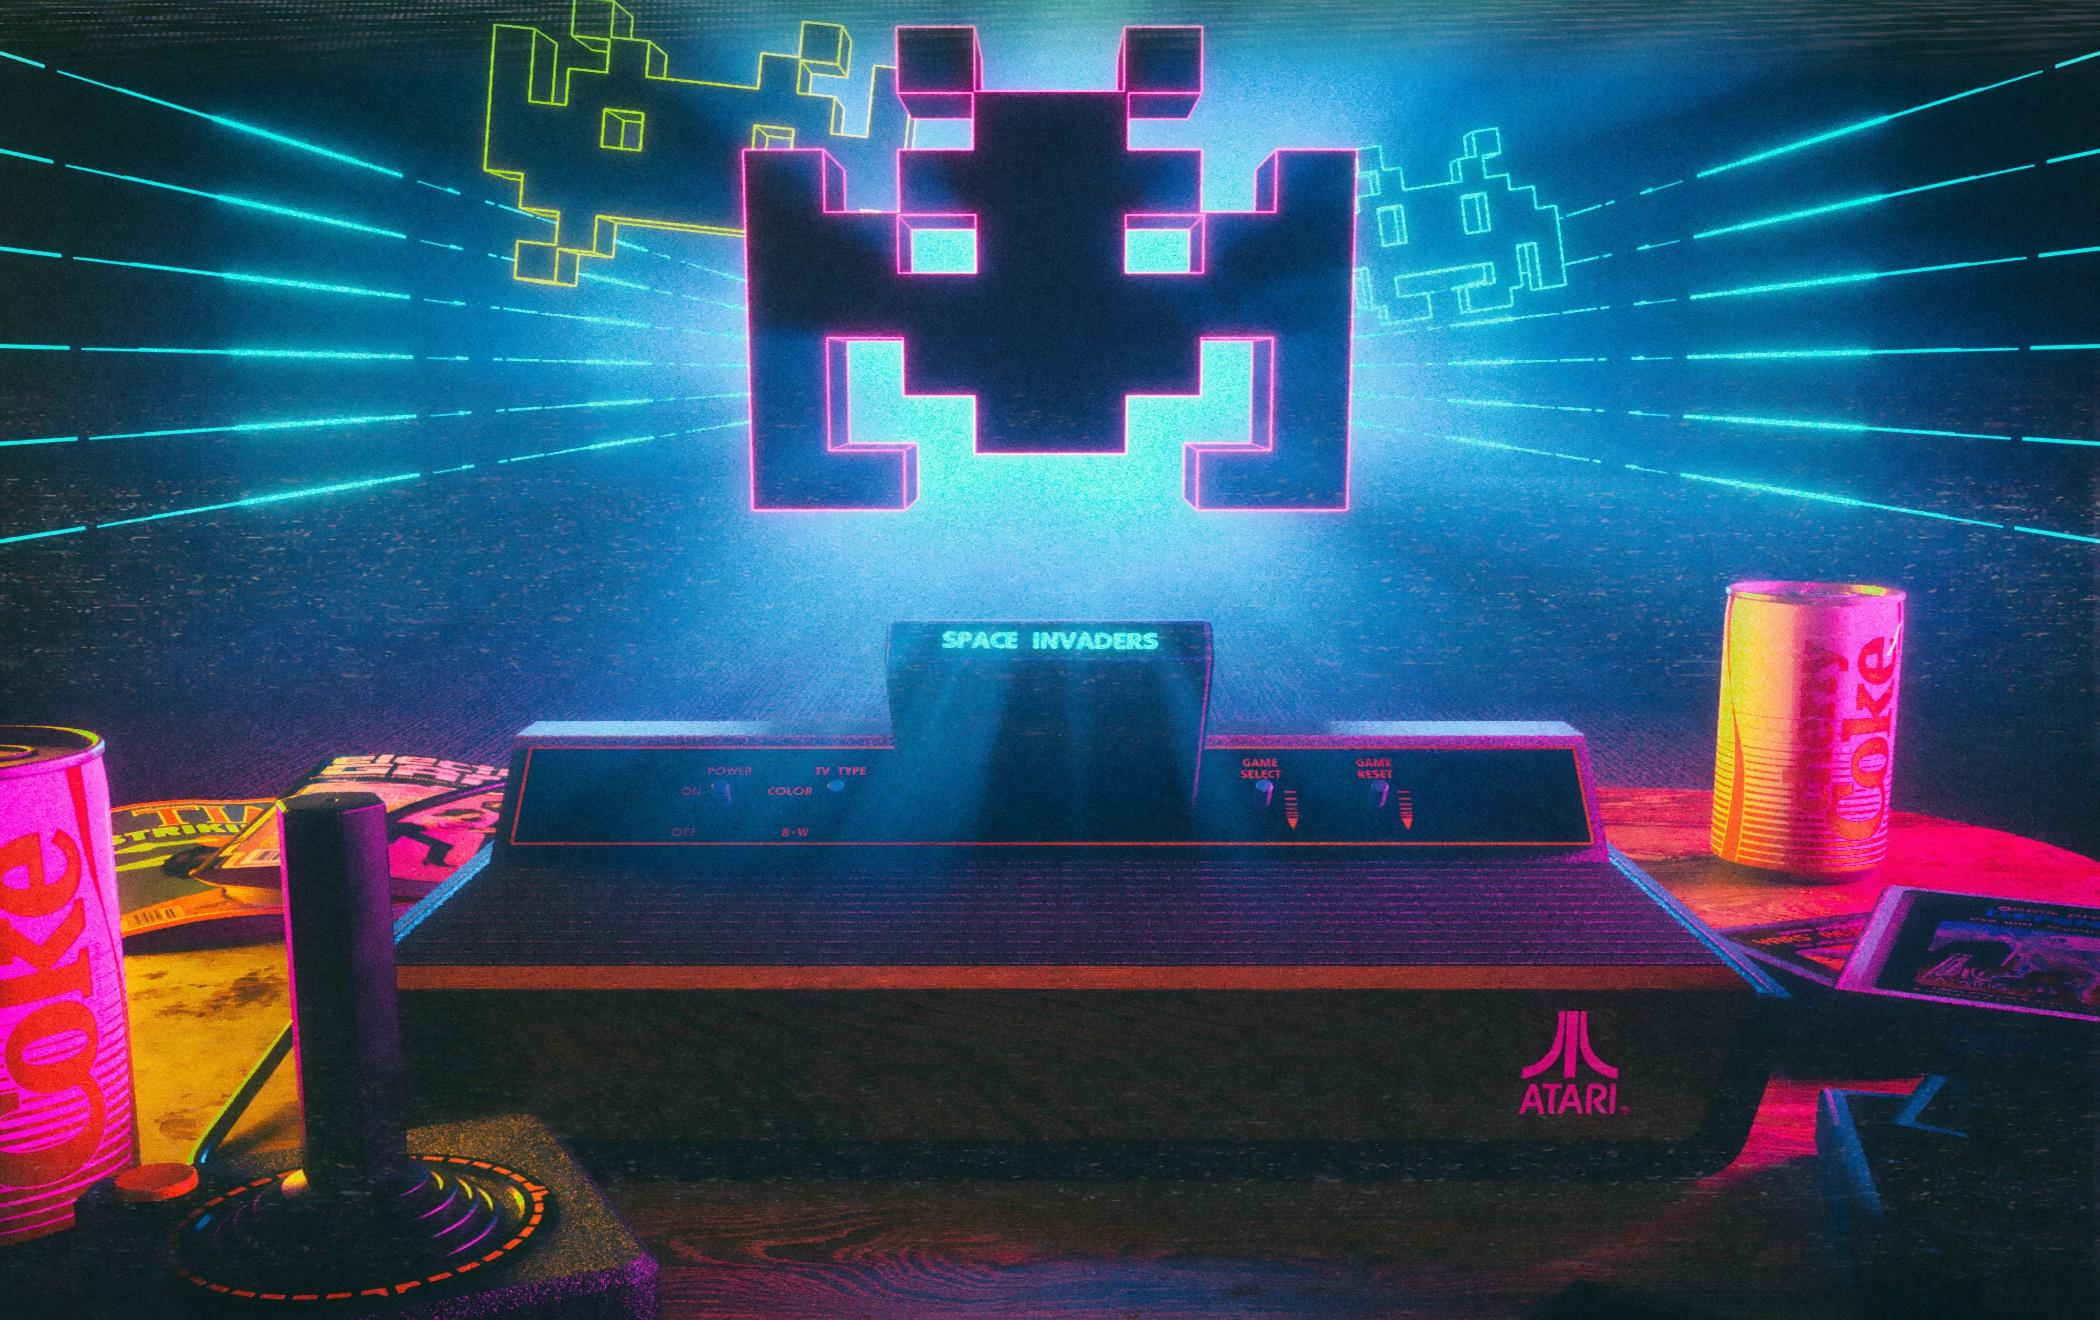 General 2100x1320 video games Space Invaders Atari joystick cherry coke consoles can neon 3D David Legnon film grain